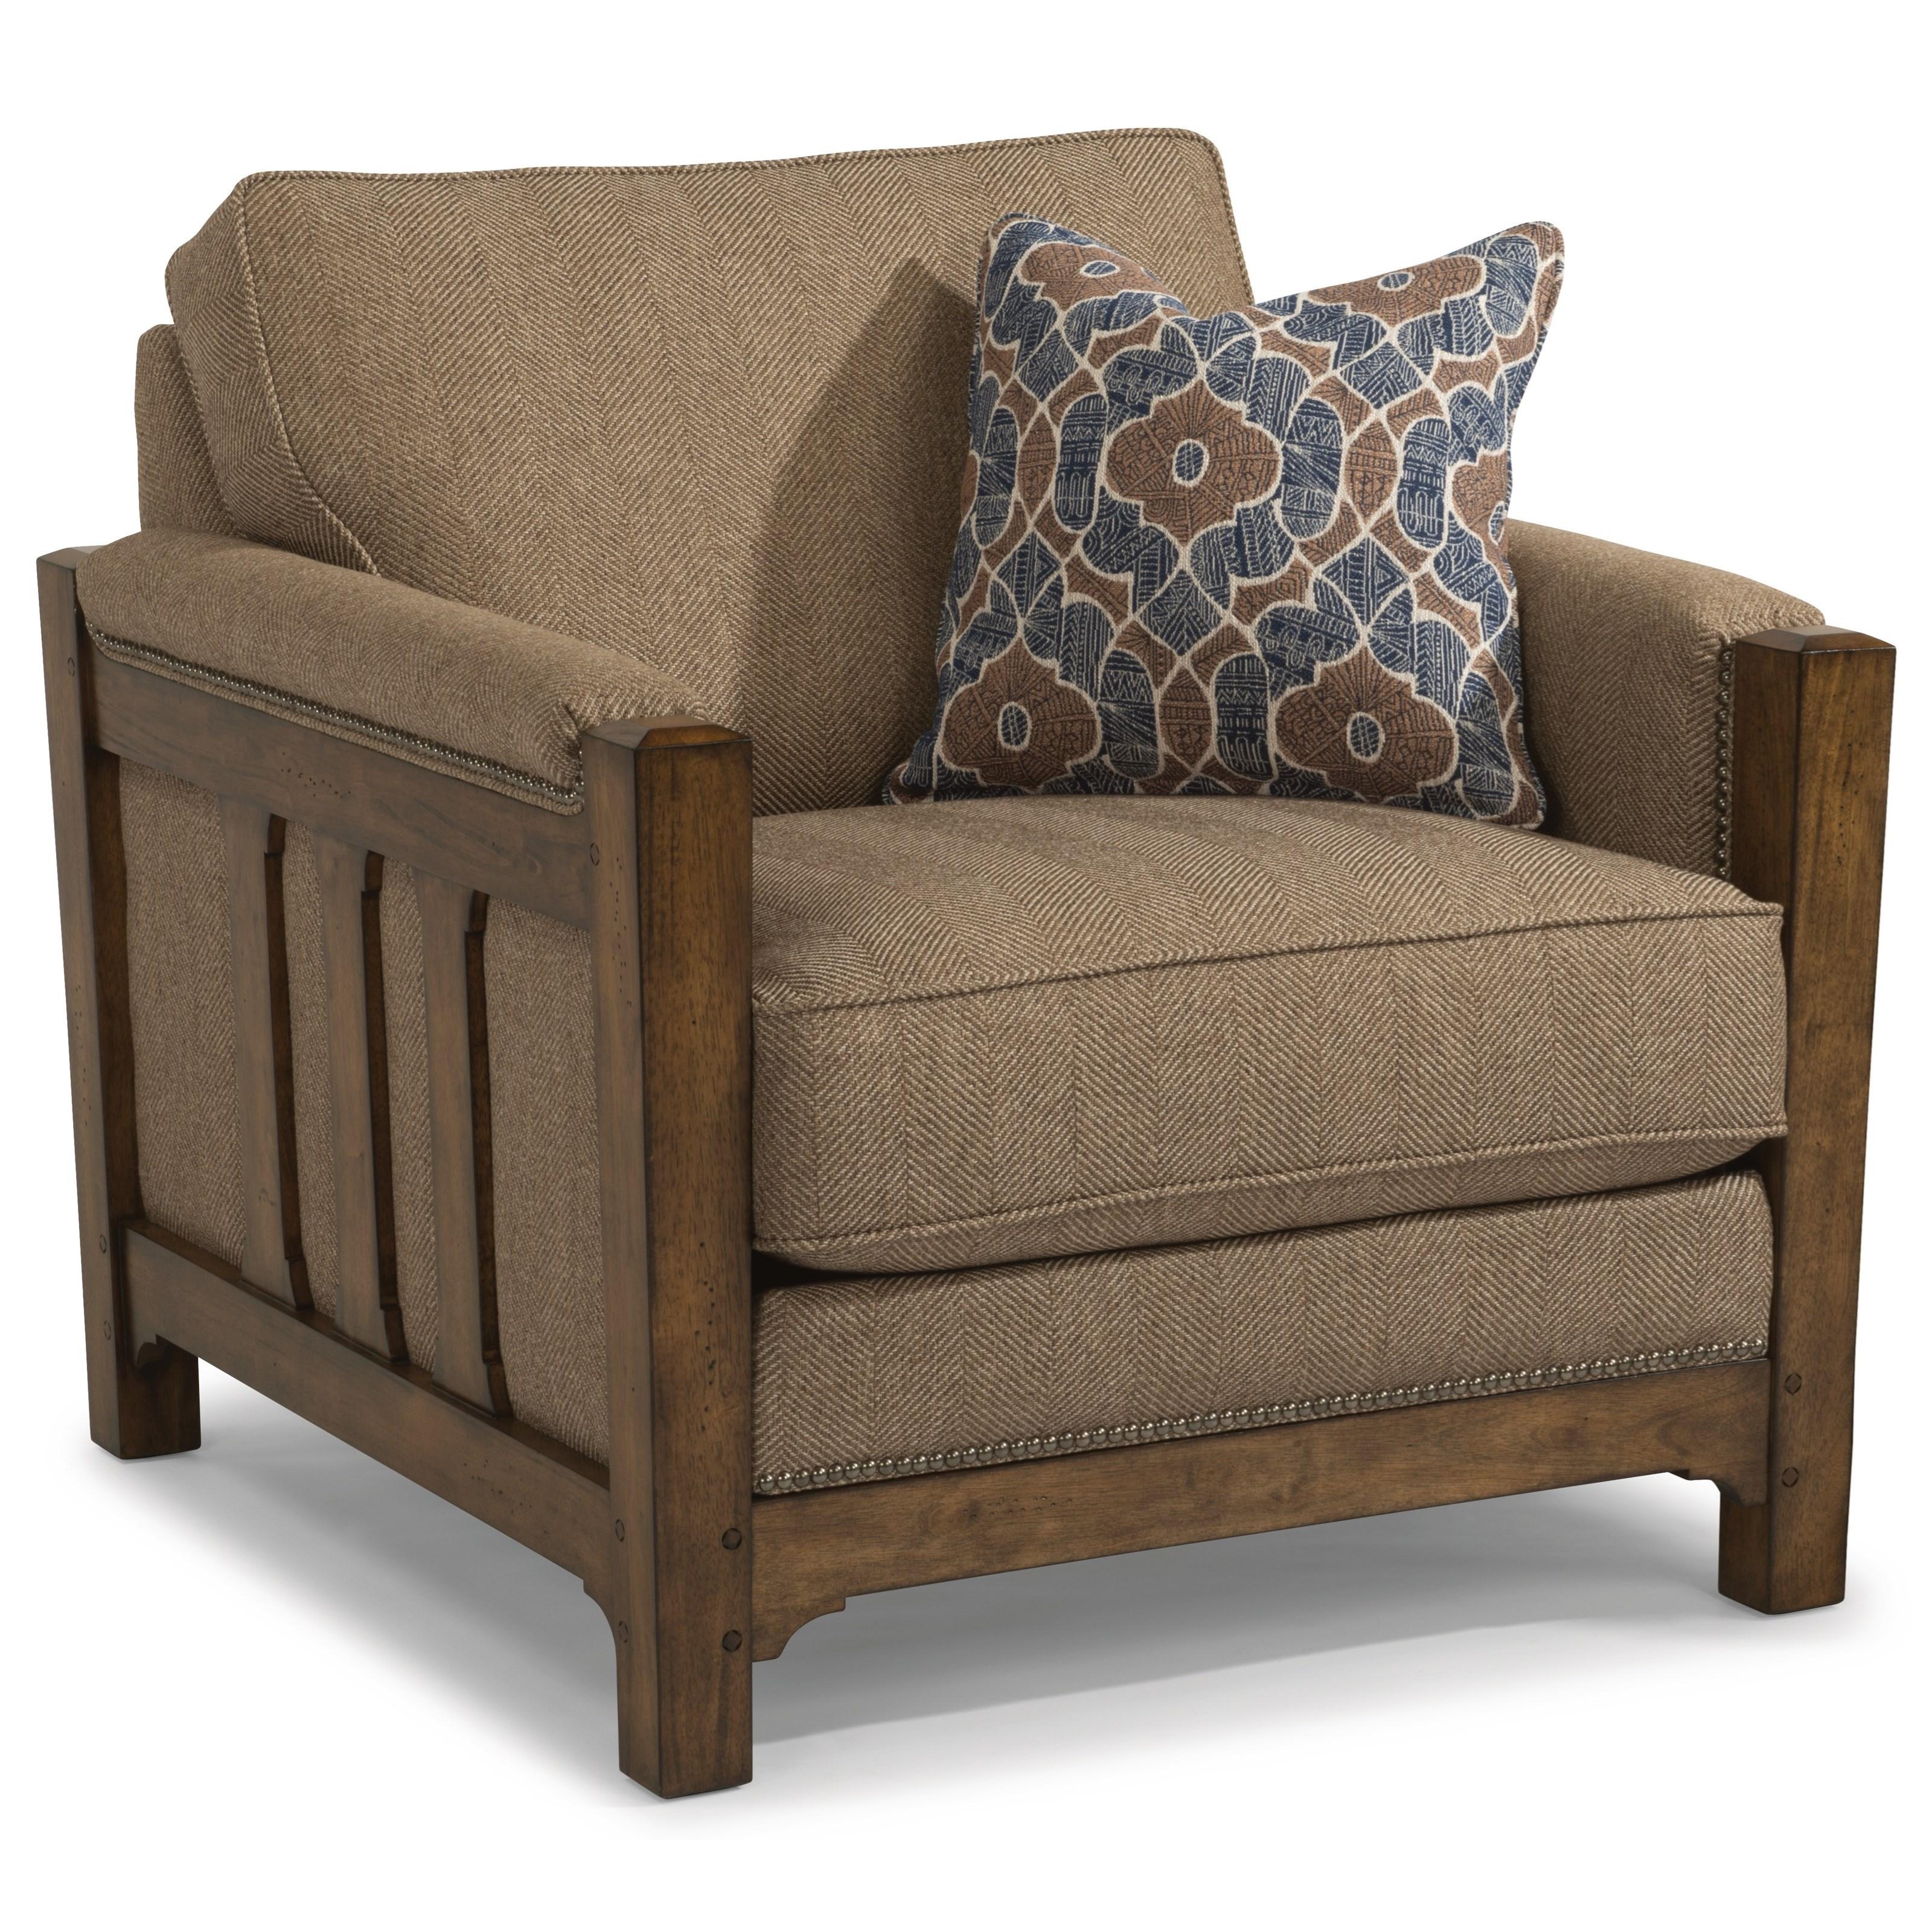 Merveilleux Flexsteel Sonora Mission Chair With Nailhead Trim | Crowley Furniture U0026  Mattress | Upholstered Chairs